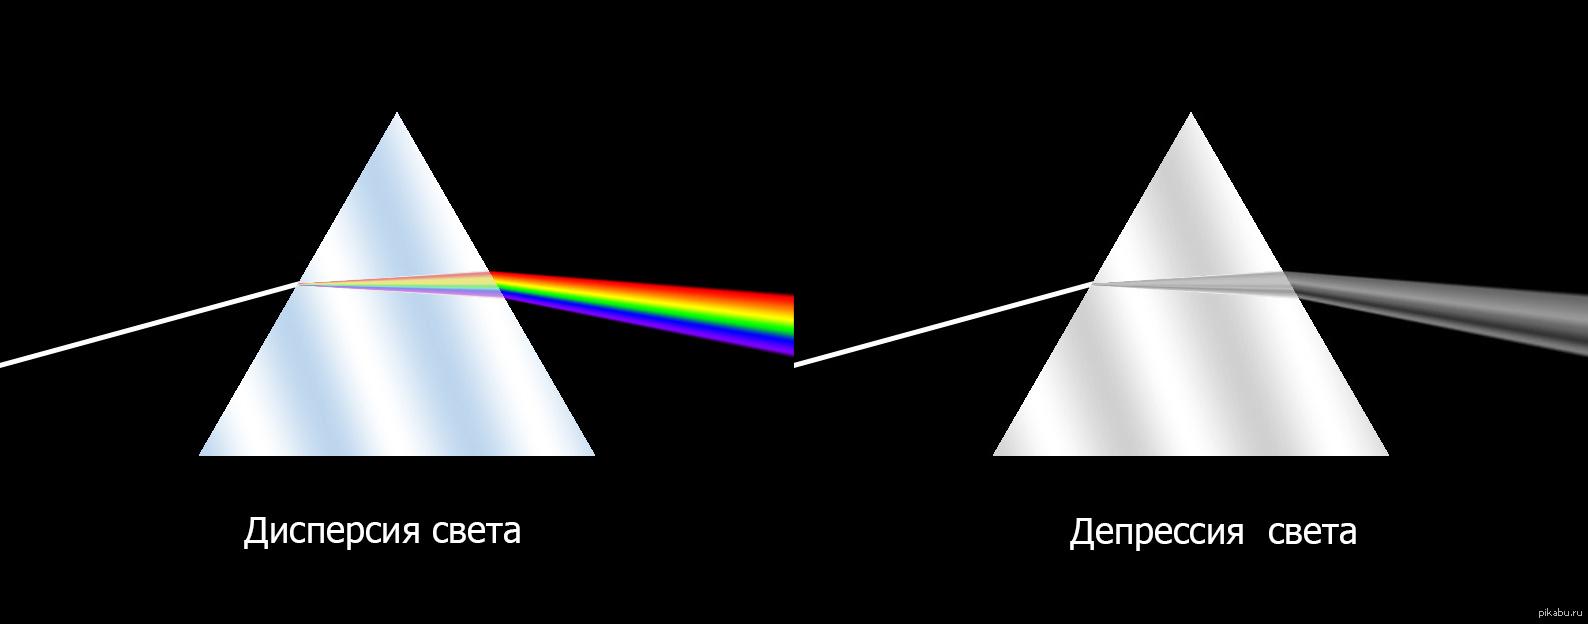 Дисперсия света — википедия. что такое дисперсия света